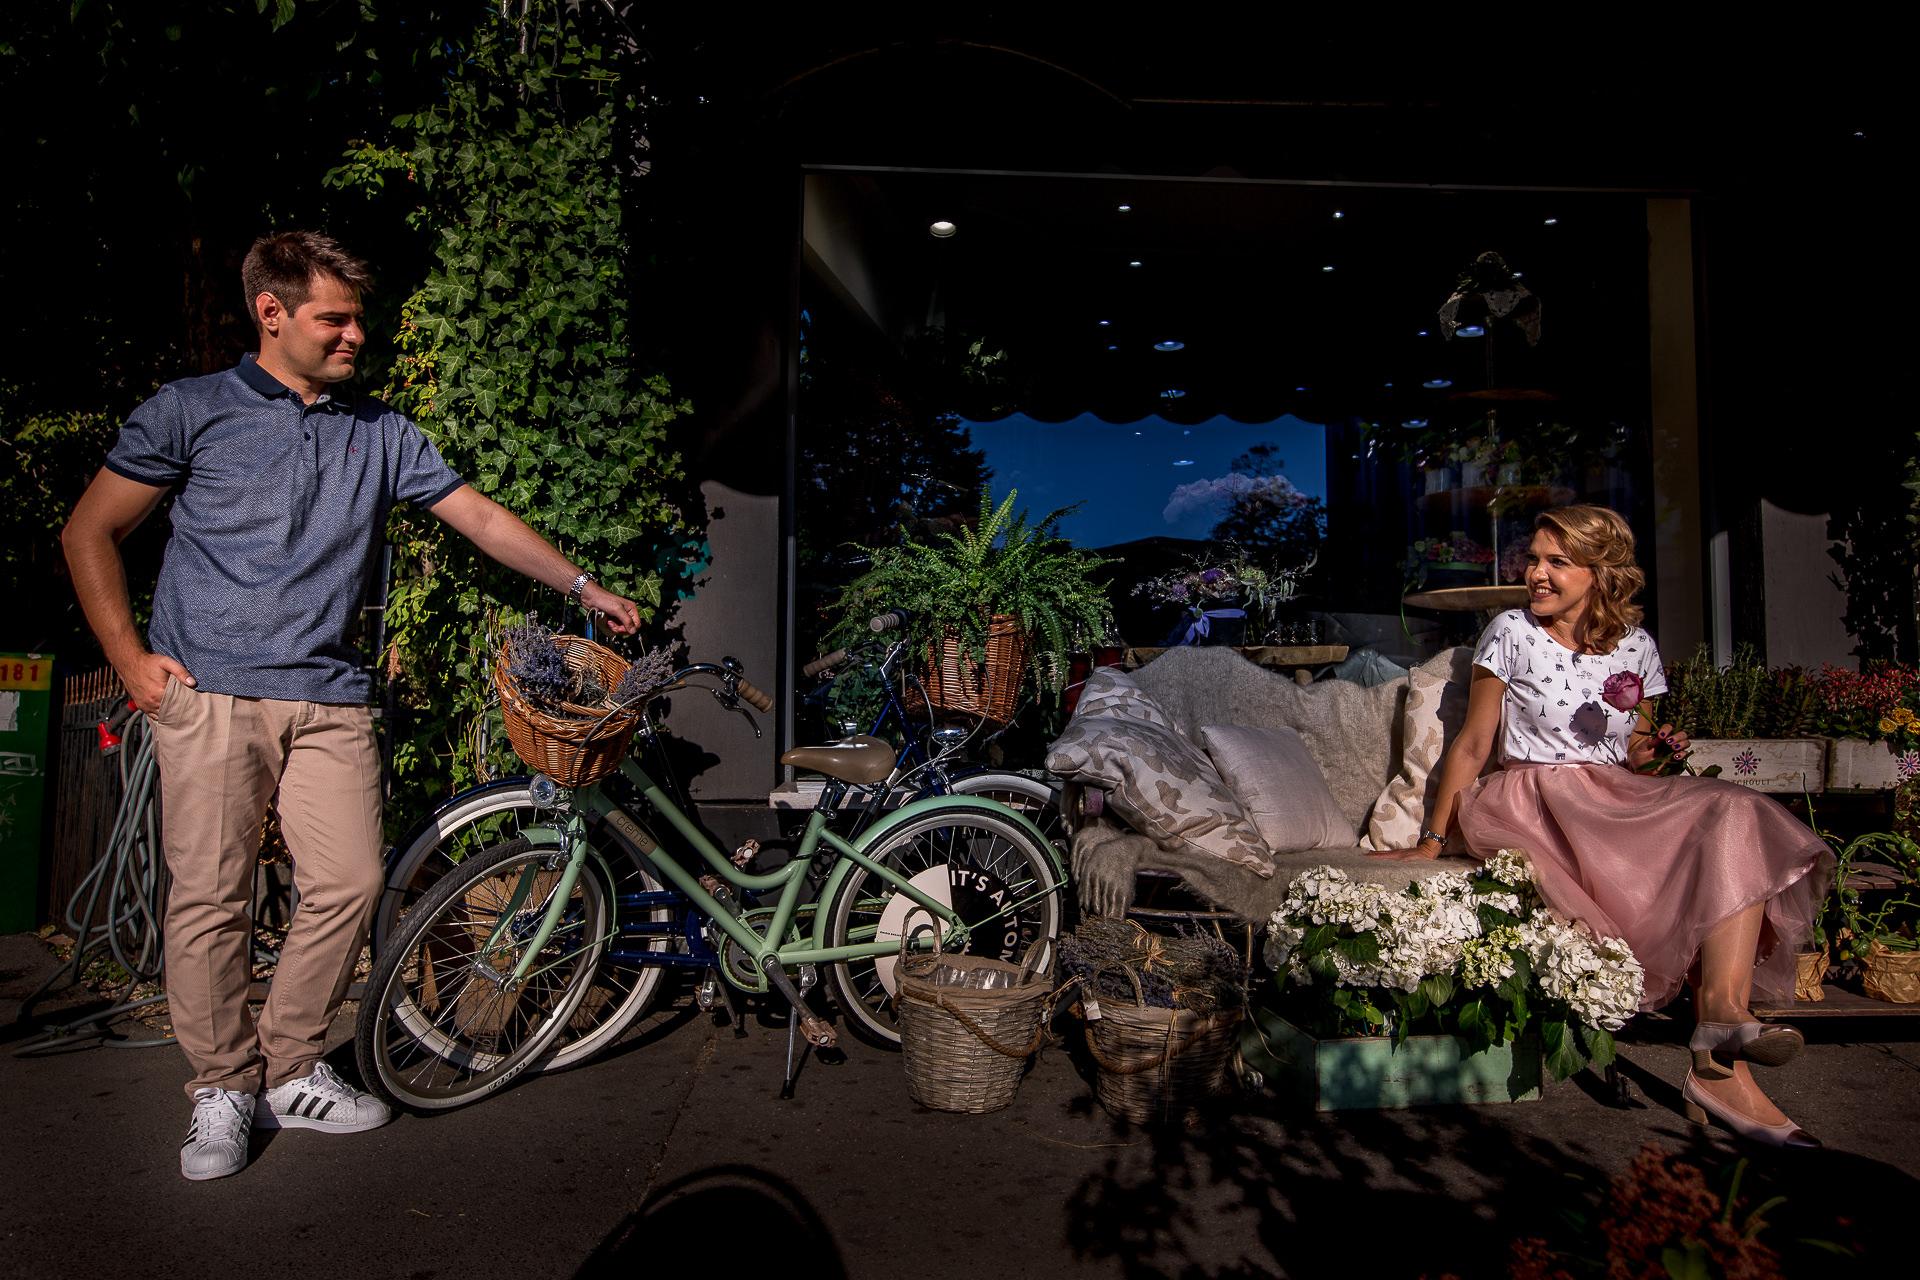 Sedinta foto Dorobanti / Strada Paris - Mihai Zaharia Photography - 04